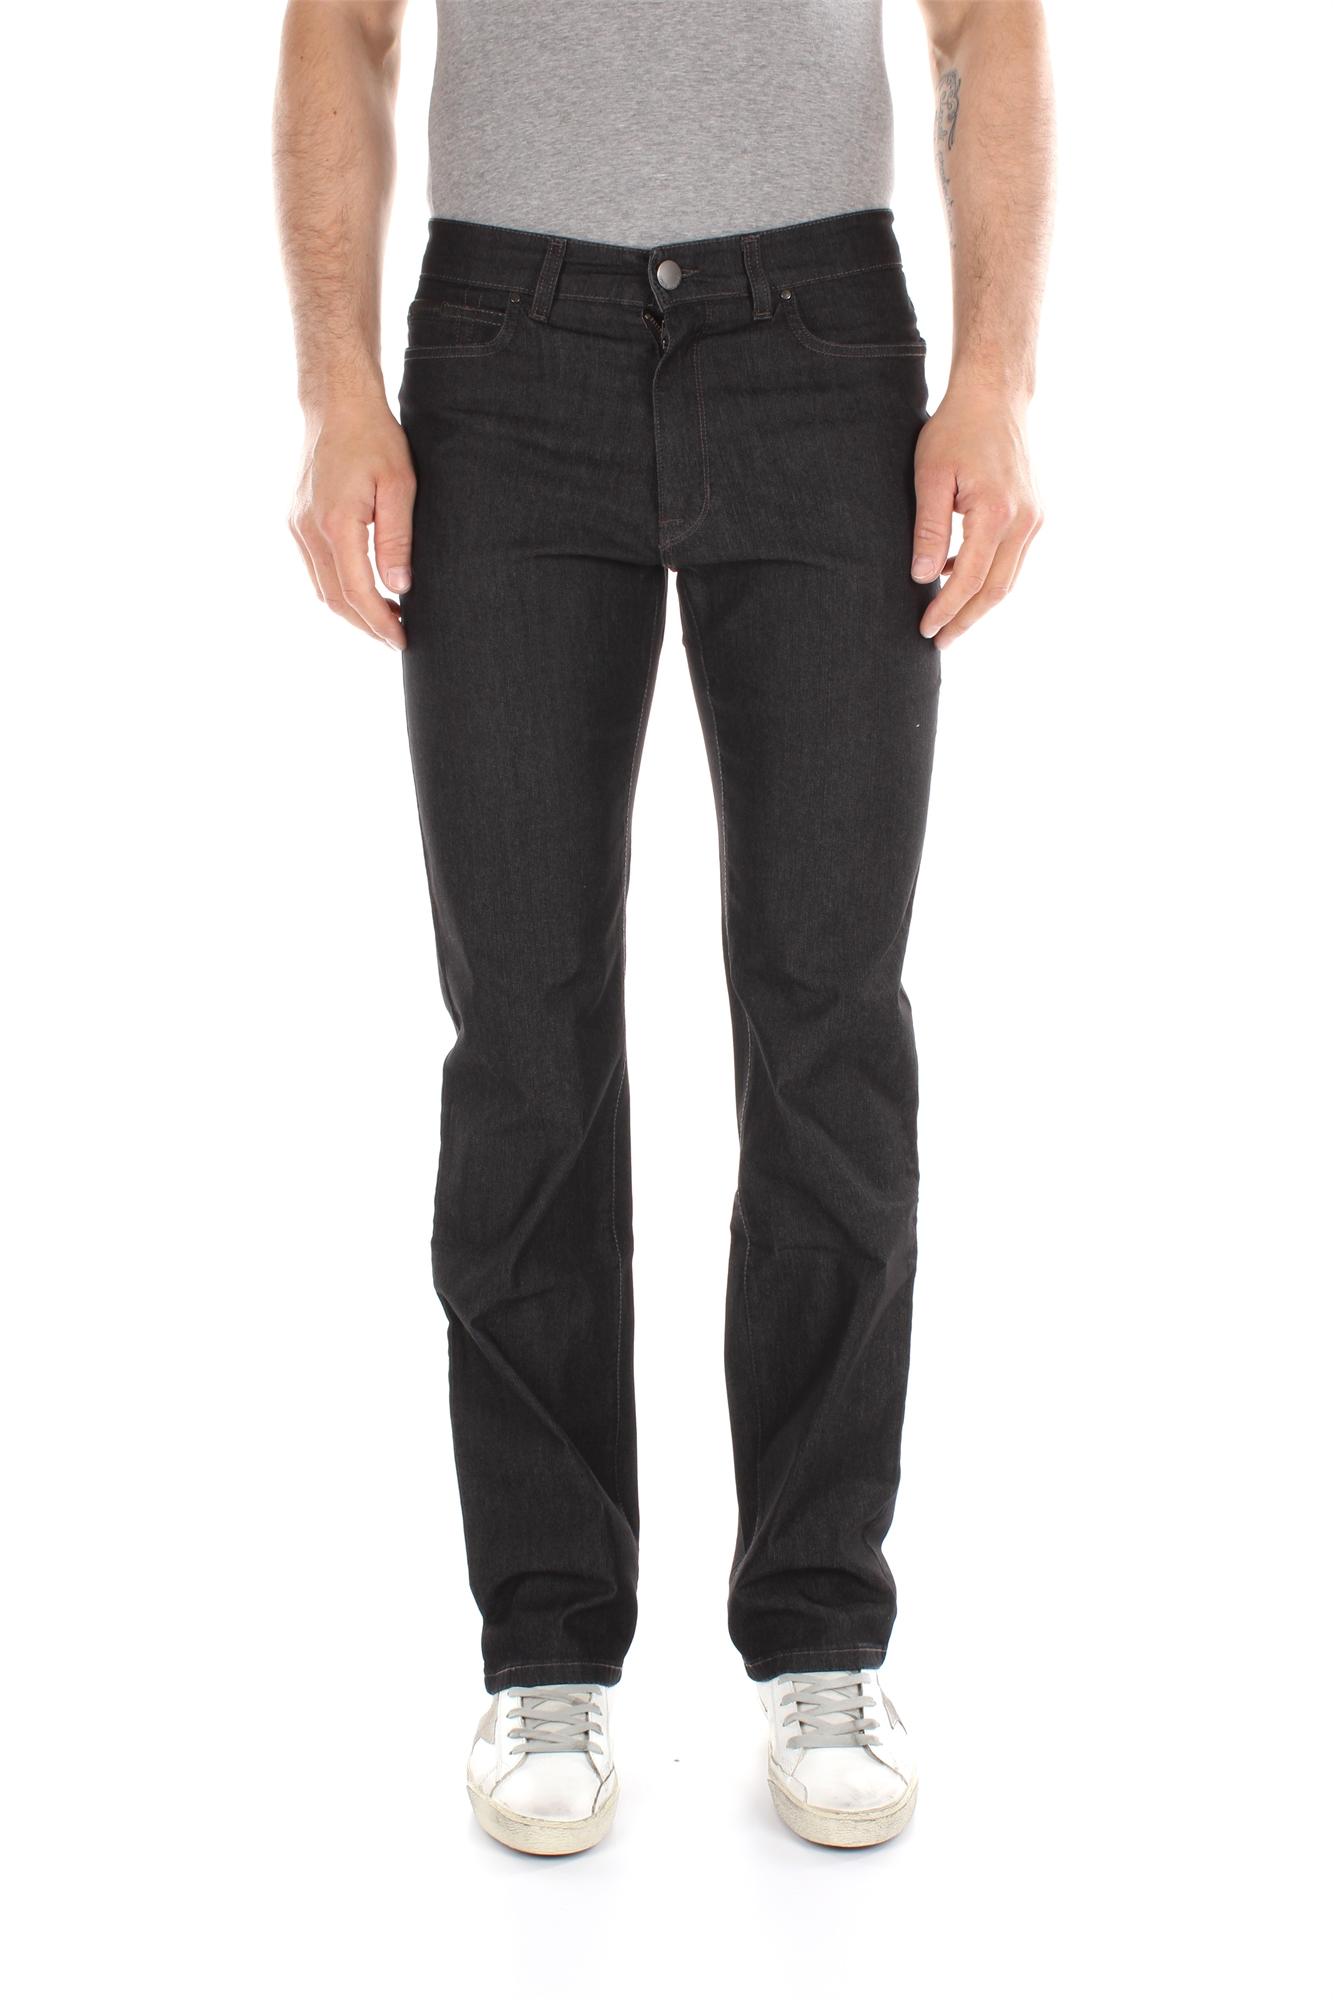 jeans trussardi herren baumwolle schwarz 52532019 ebay. Black Bedroom Furniture Sets. Home Design Ideas